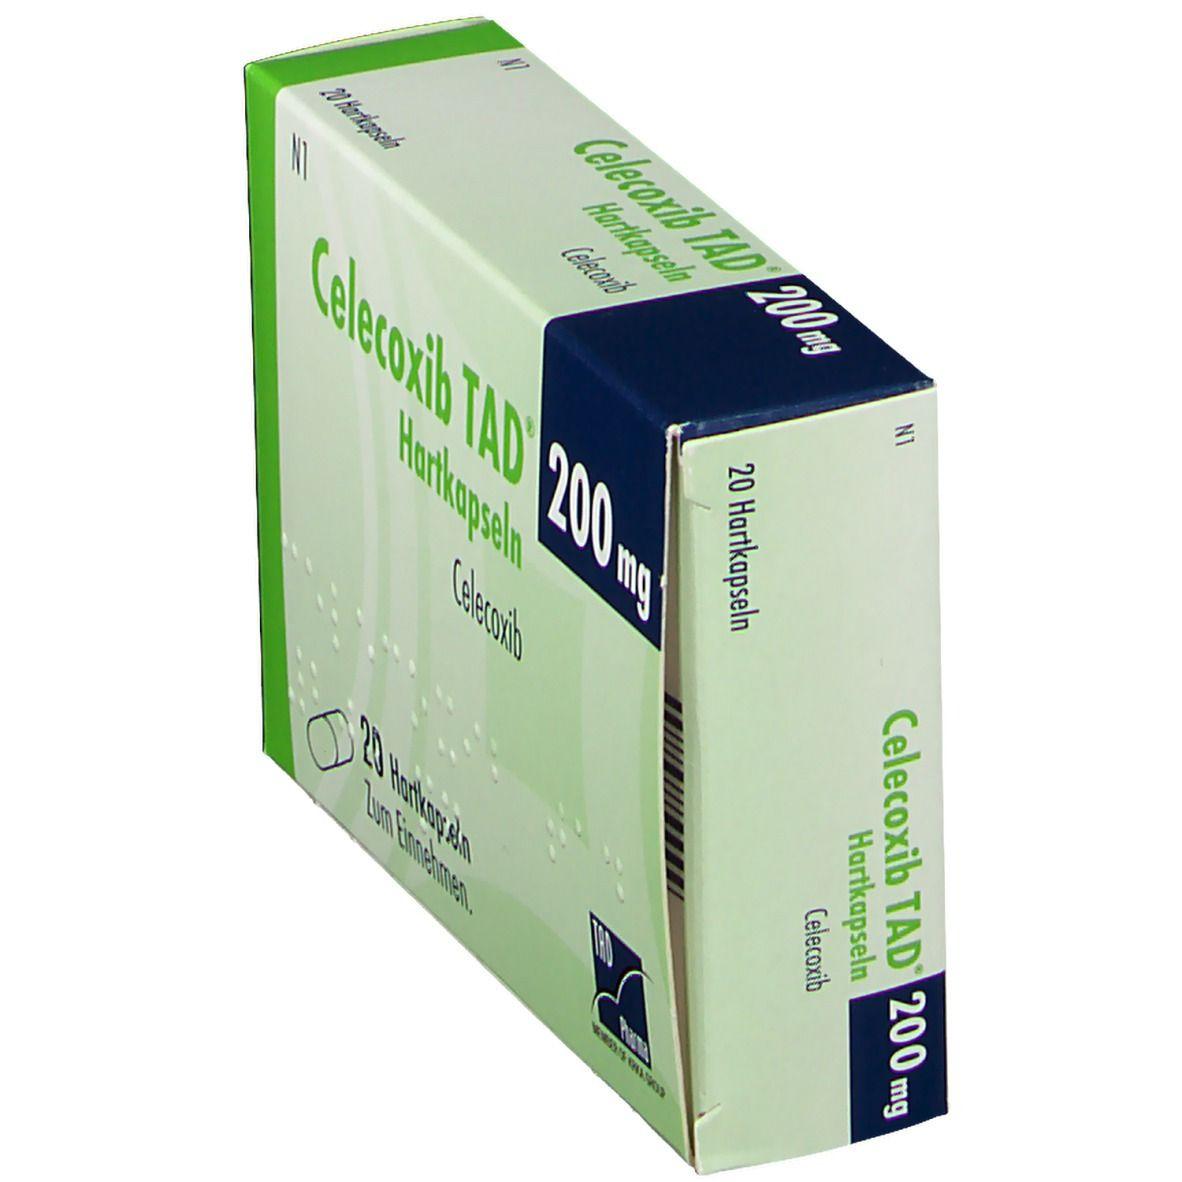 Modafinil 200 mg hcl